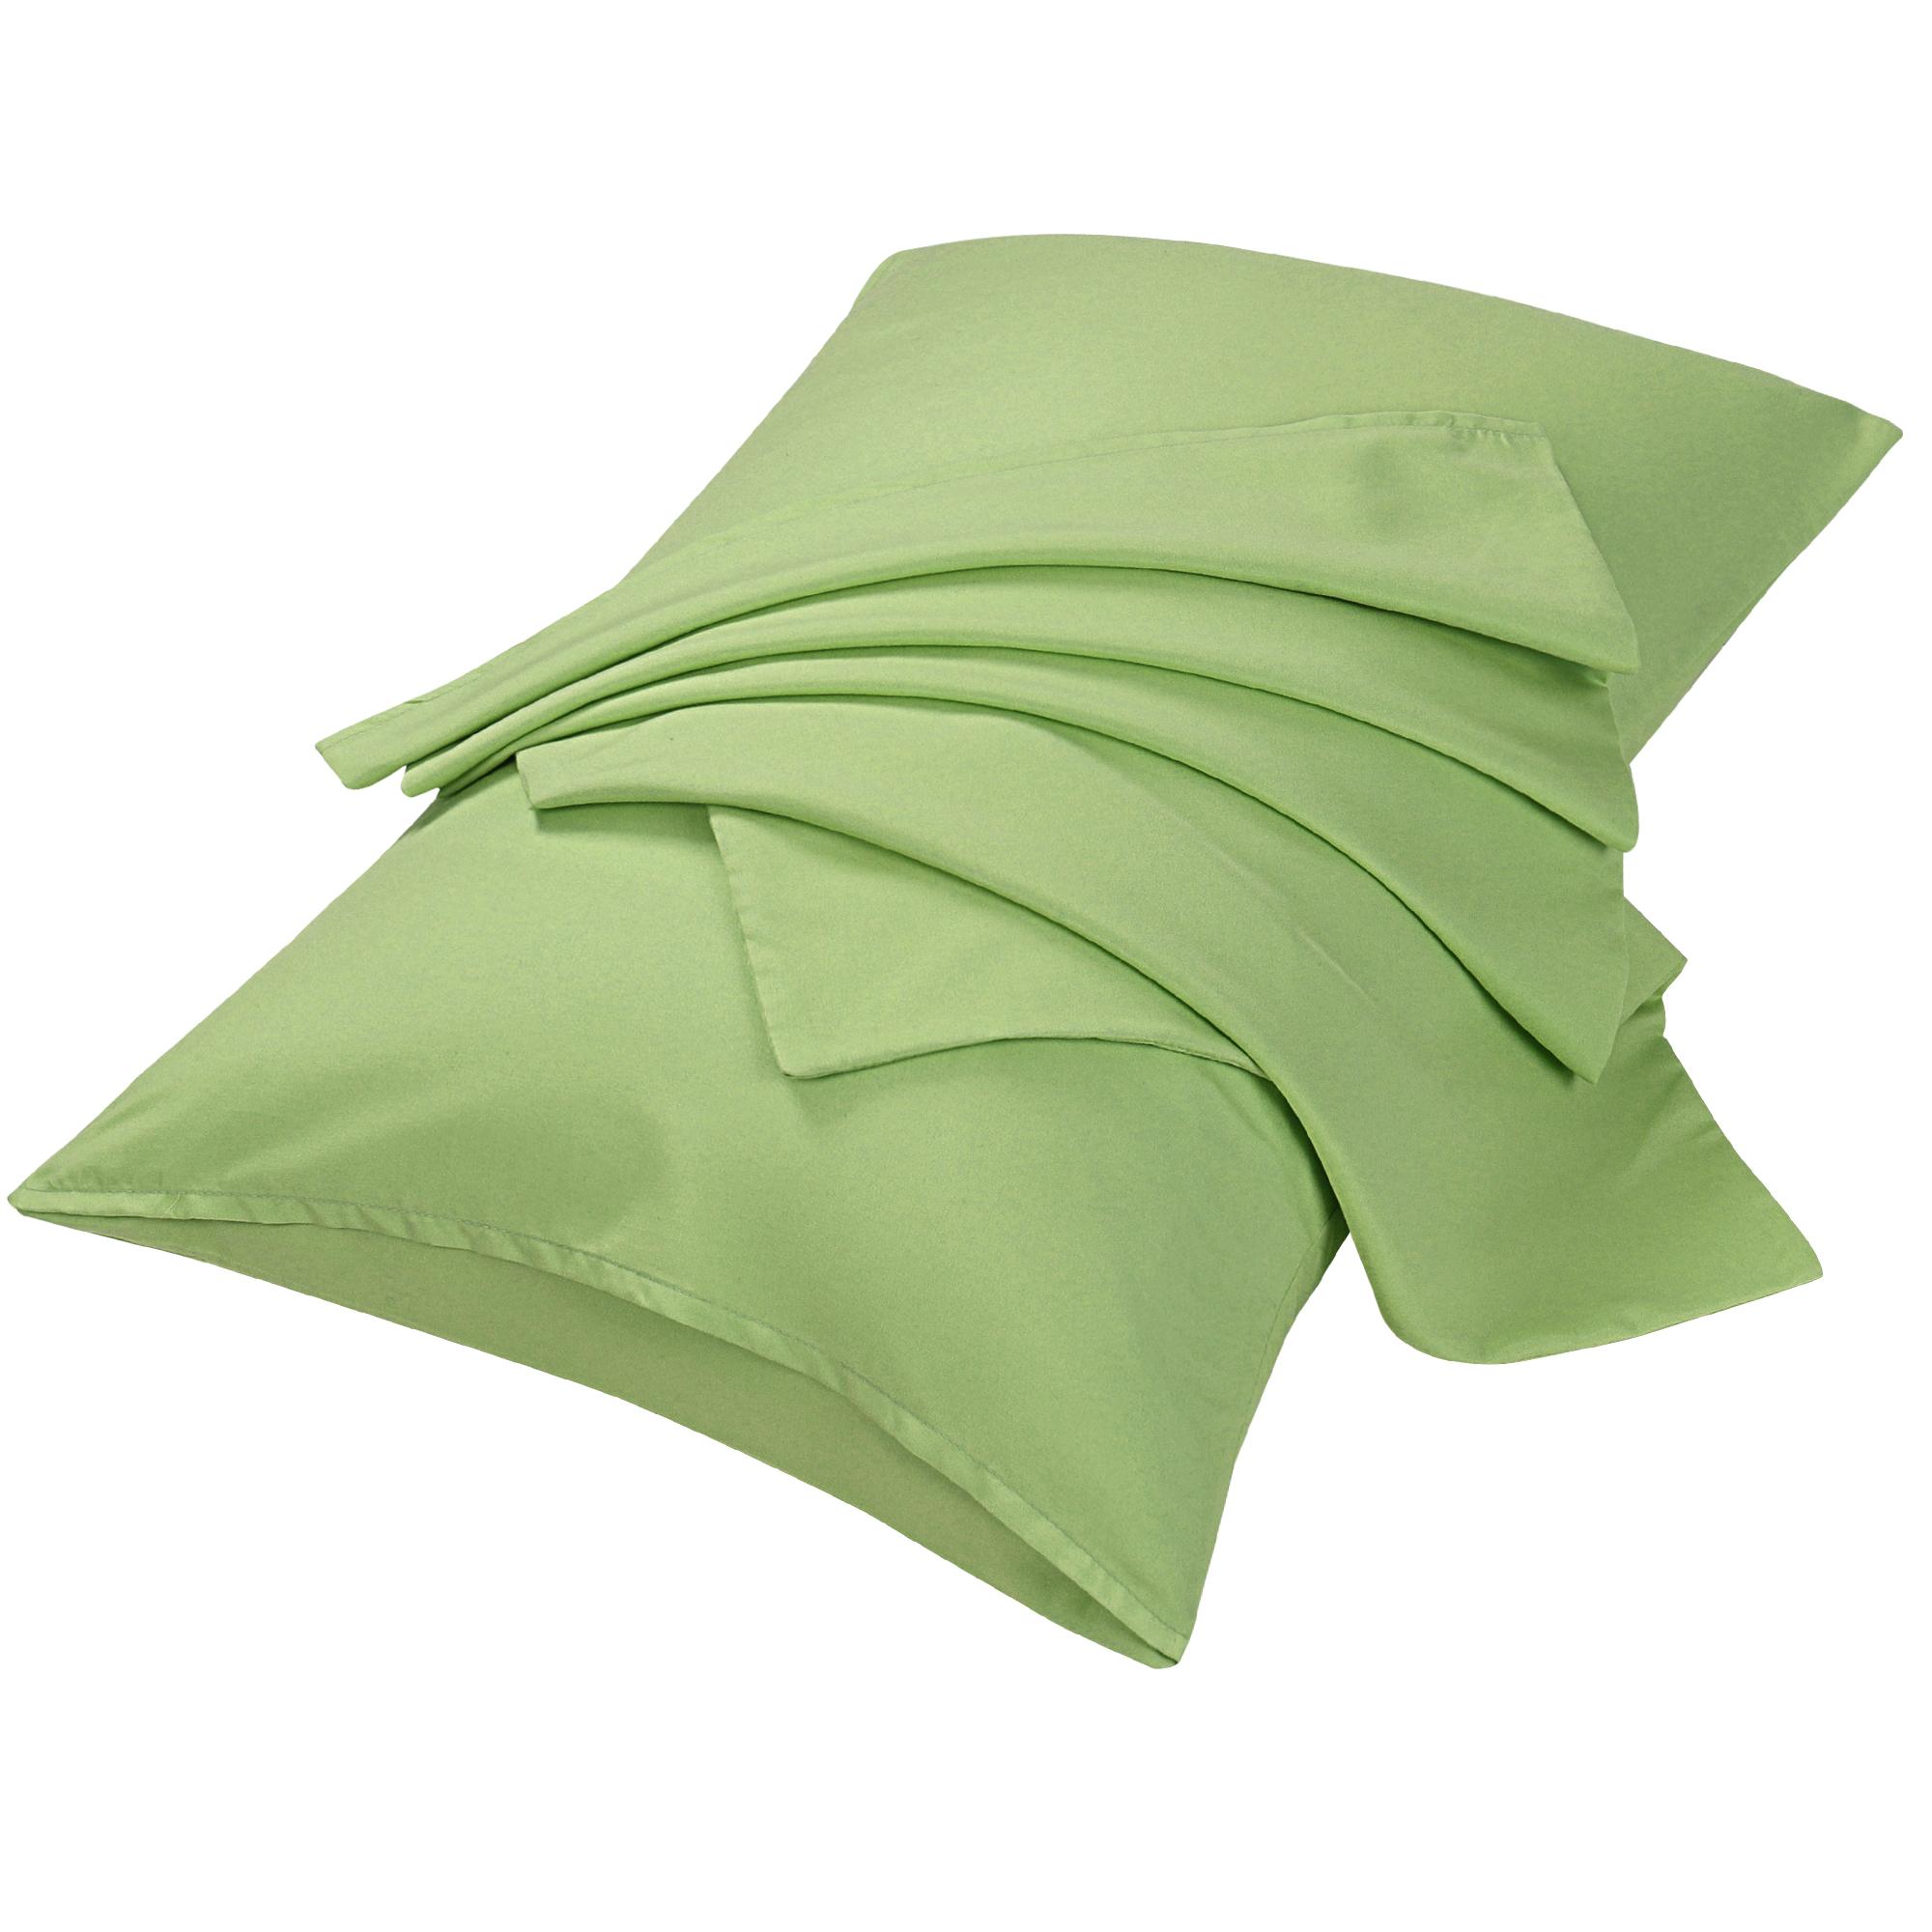 "2pcs Pillowcases Soft Microfiber, No Wrinkle, Sage Queen (20"" x 30"")"